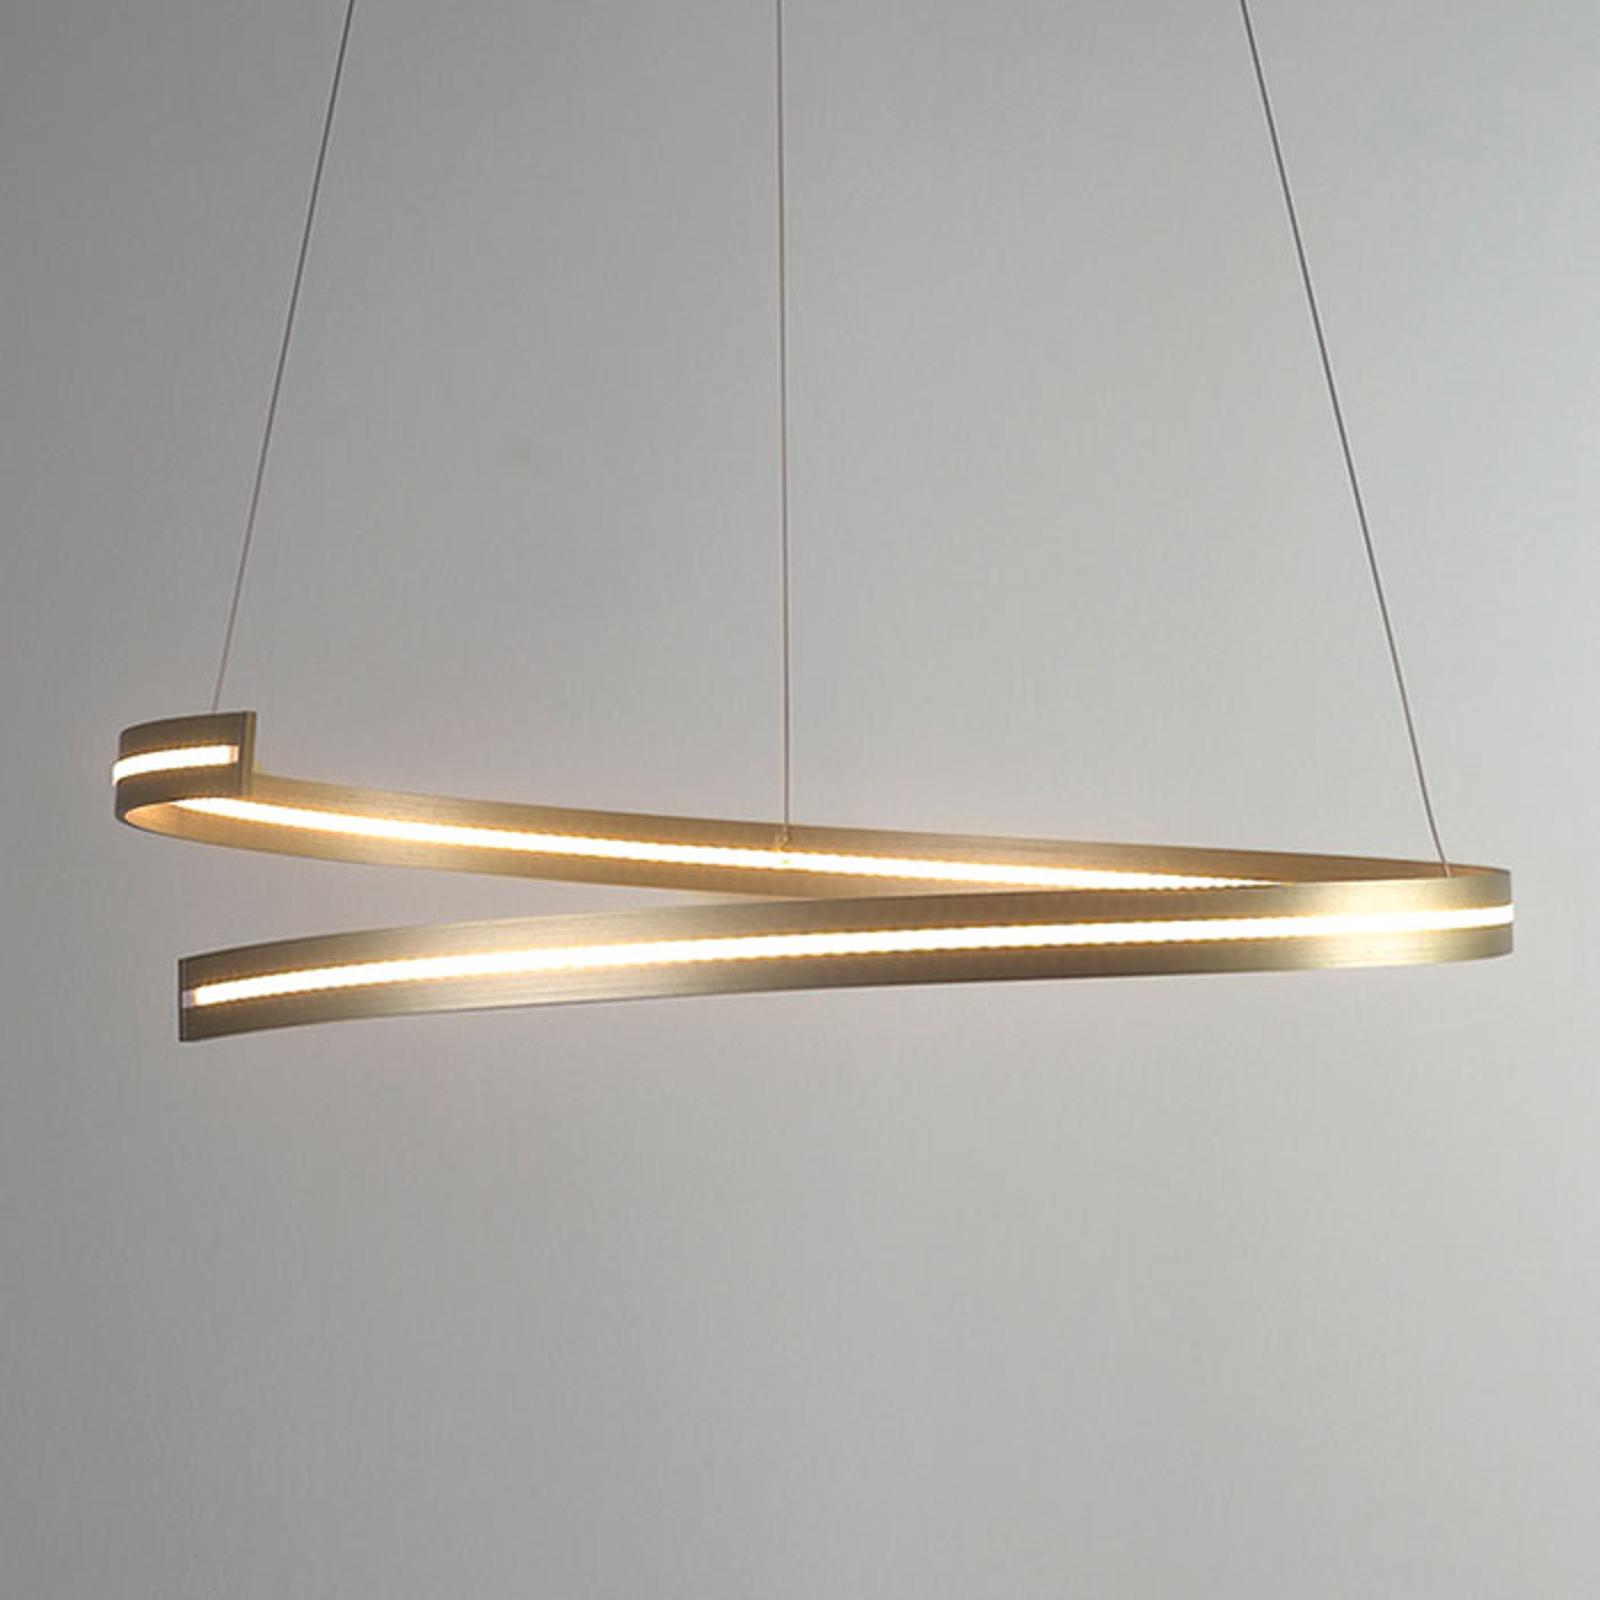 Bopp Break - LED-Hängeleuchte, 70 cm hellgold